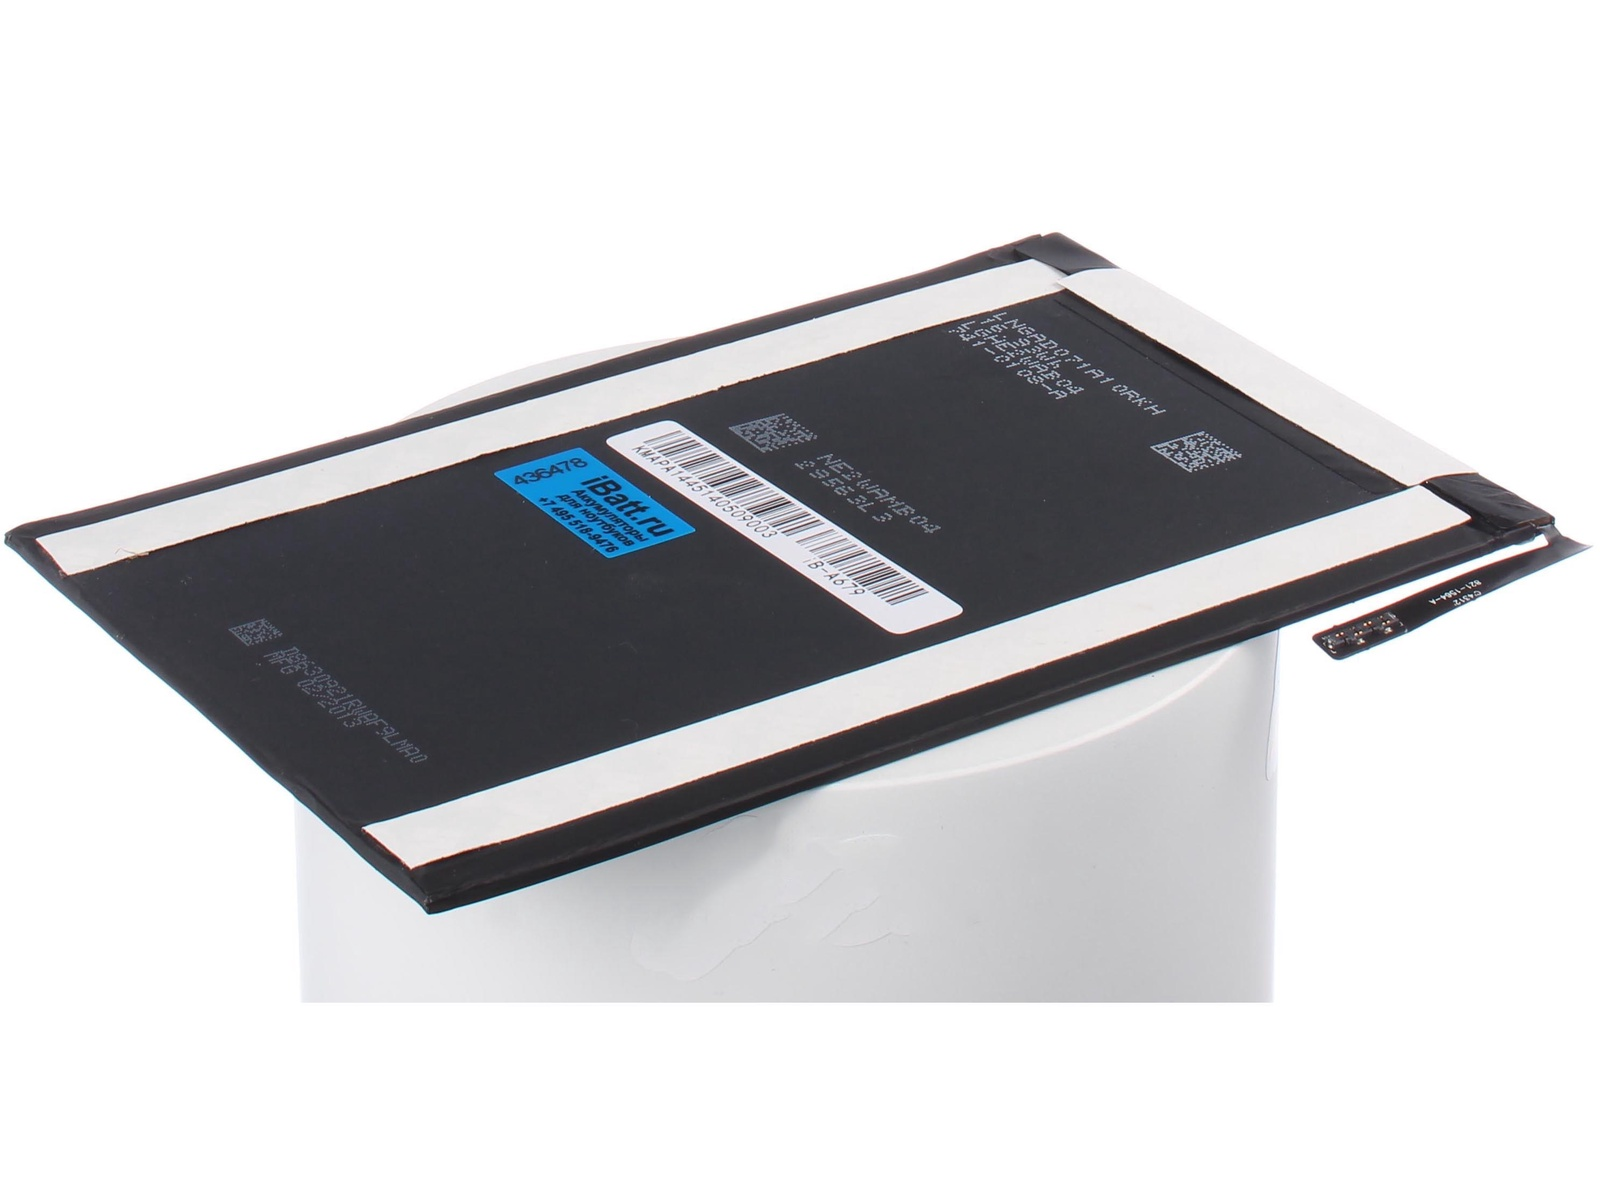 Аккумуляторная батарея iBatt iB-A1-A679 4400mAh для ноутбуков Apple тесты ноутбуков